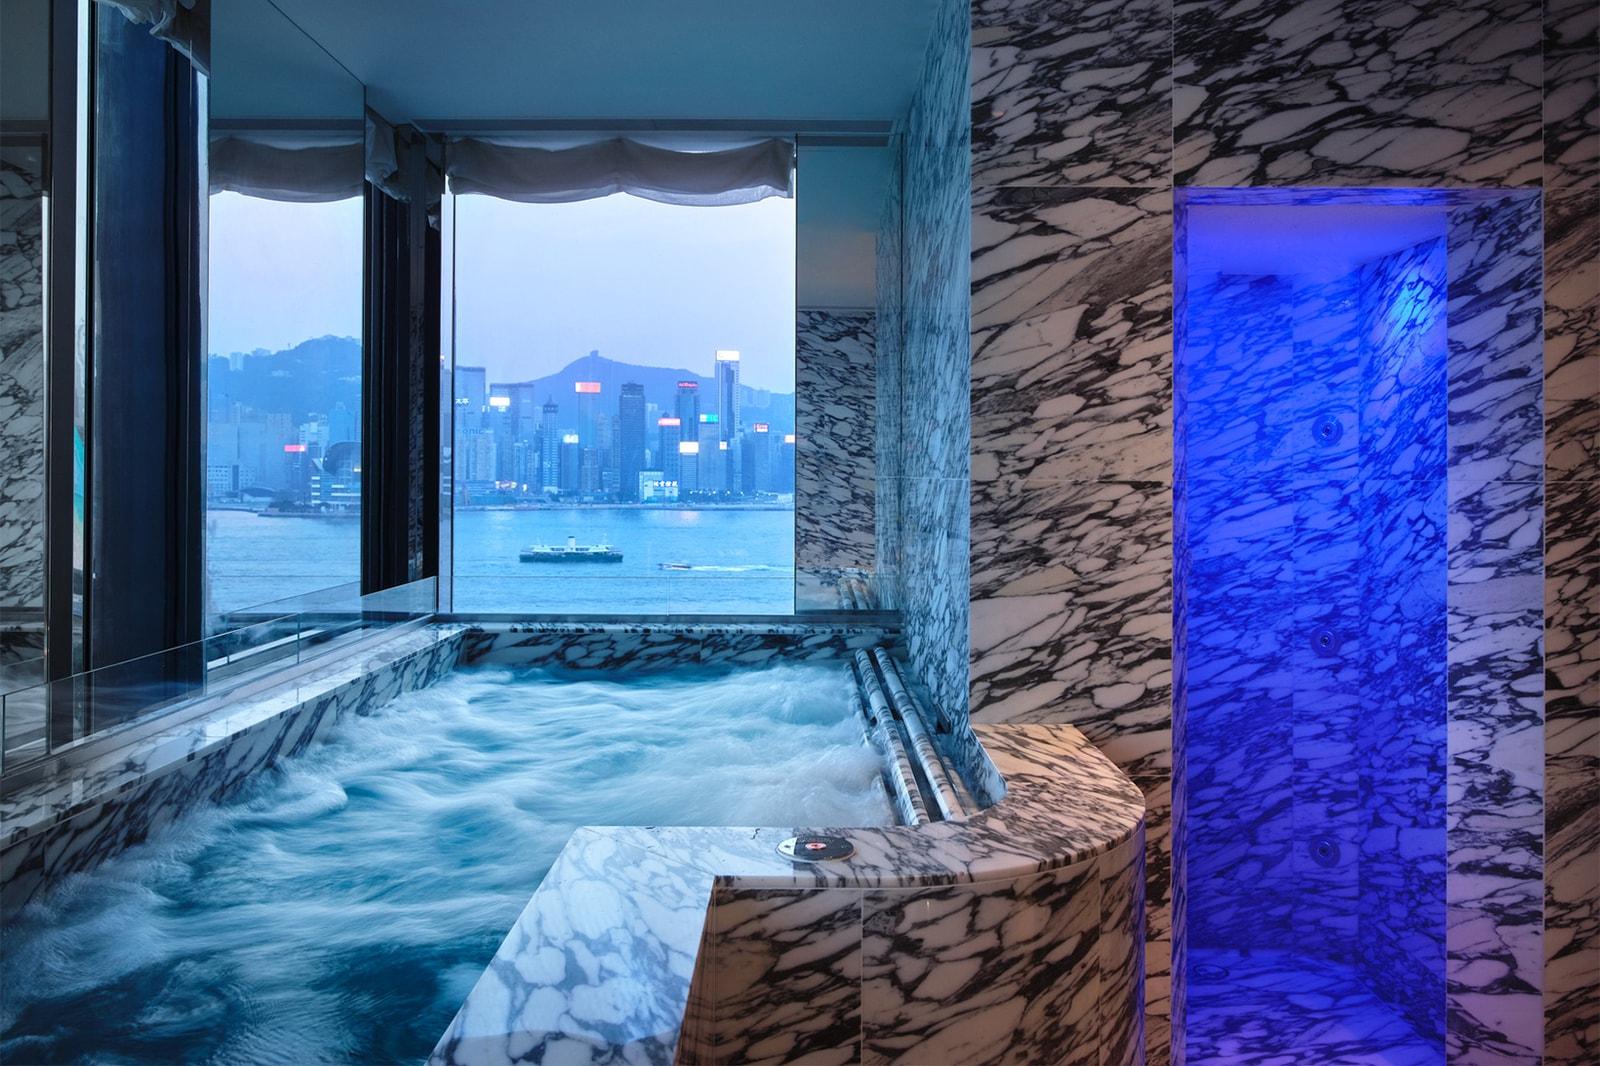 rosewood hong kong hotel asaya wellness program posture physiotherapy facial skin analysis review